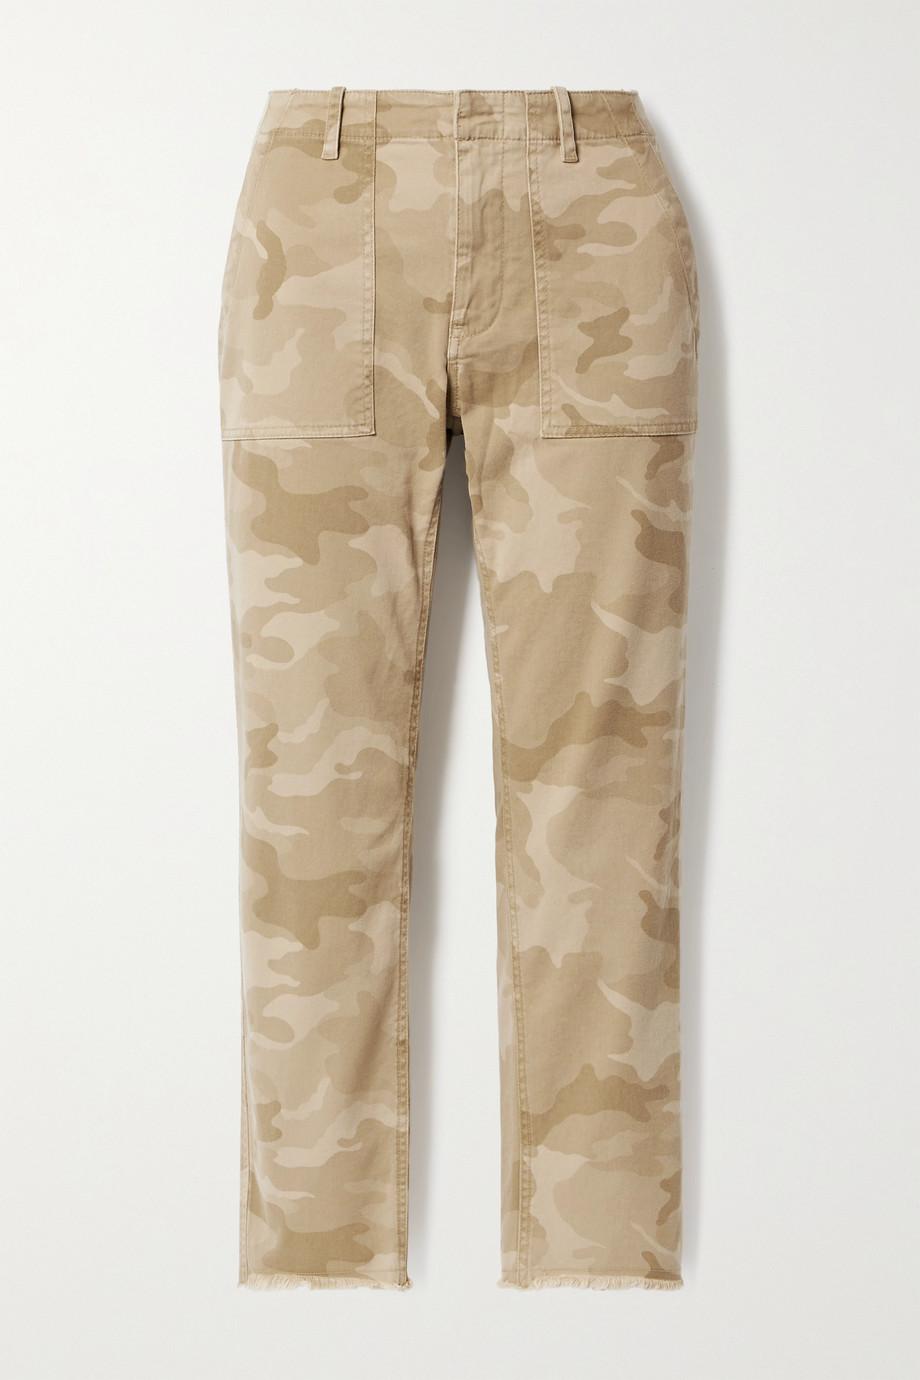 Nili Lotan Pantalon slim raccourci en serge de coton stretch à imprimé camouflage Jenna